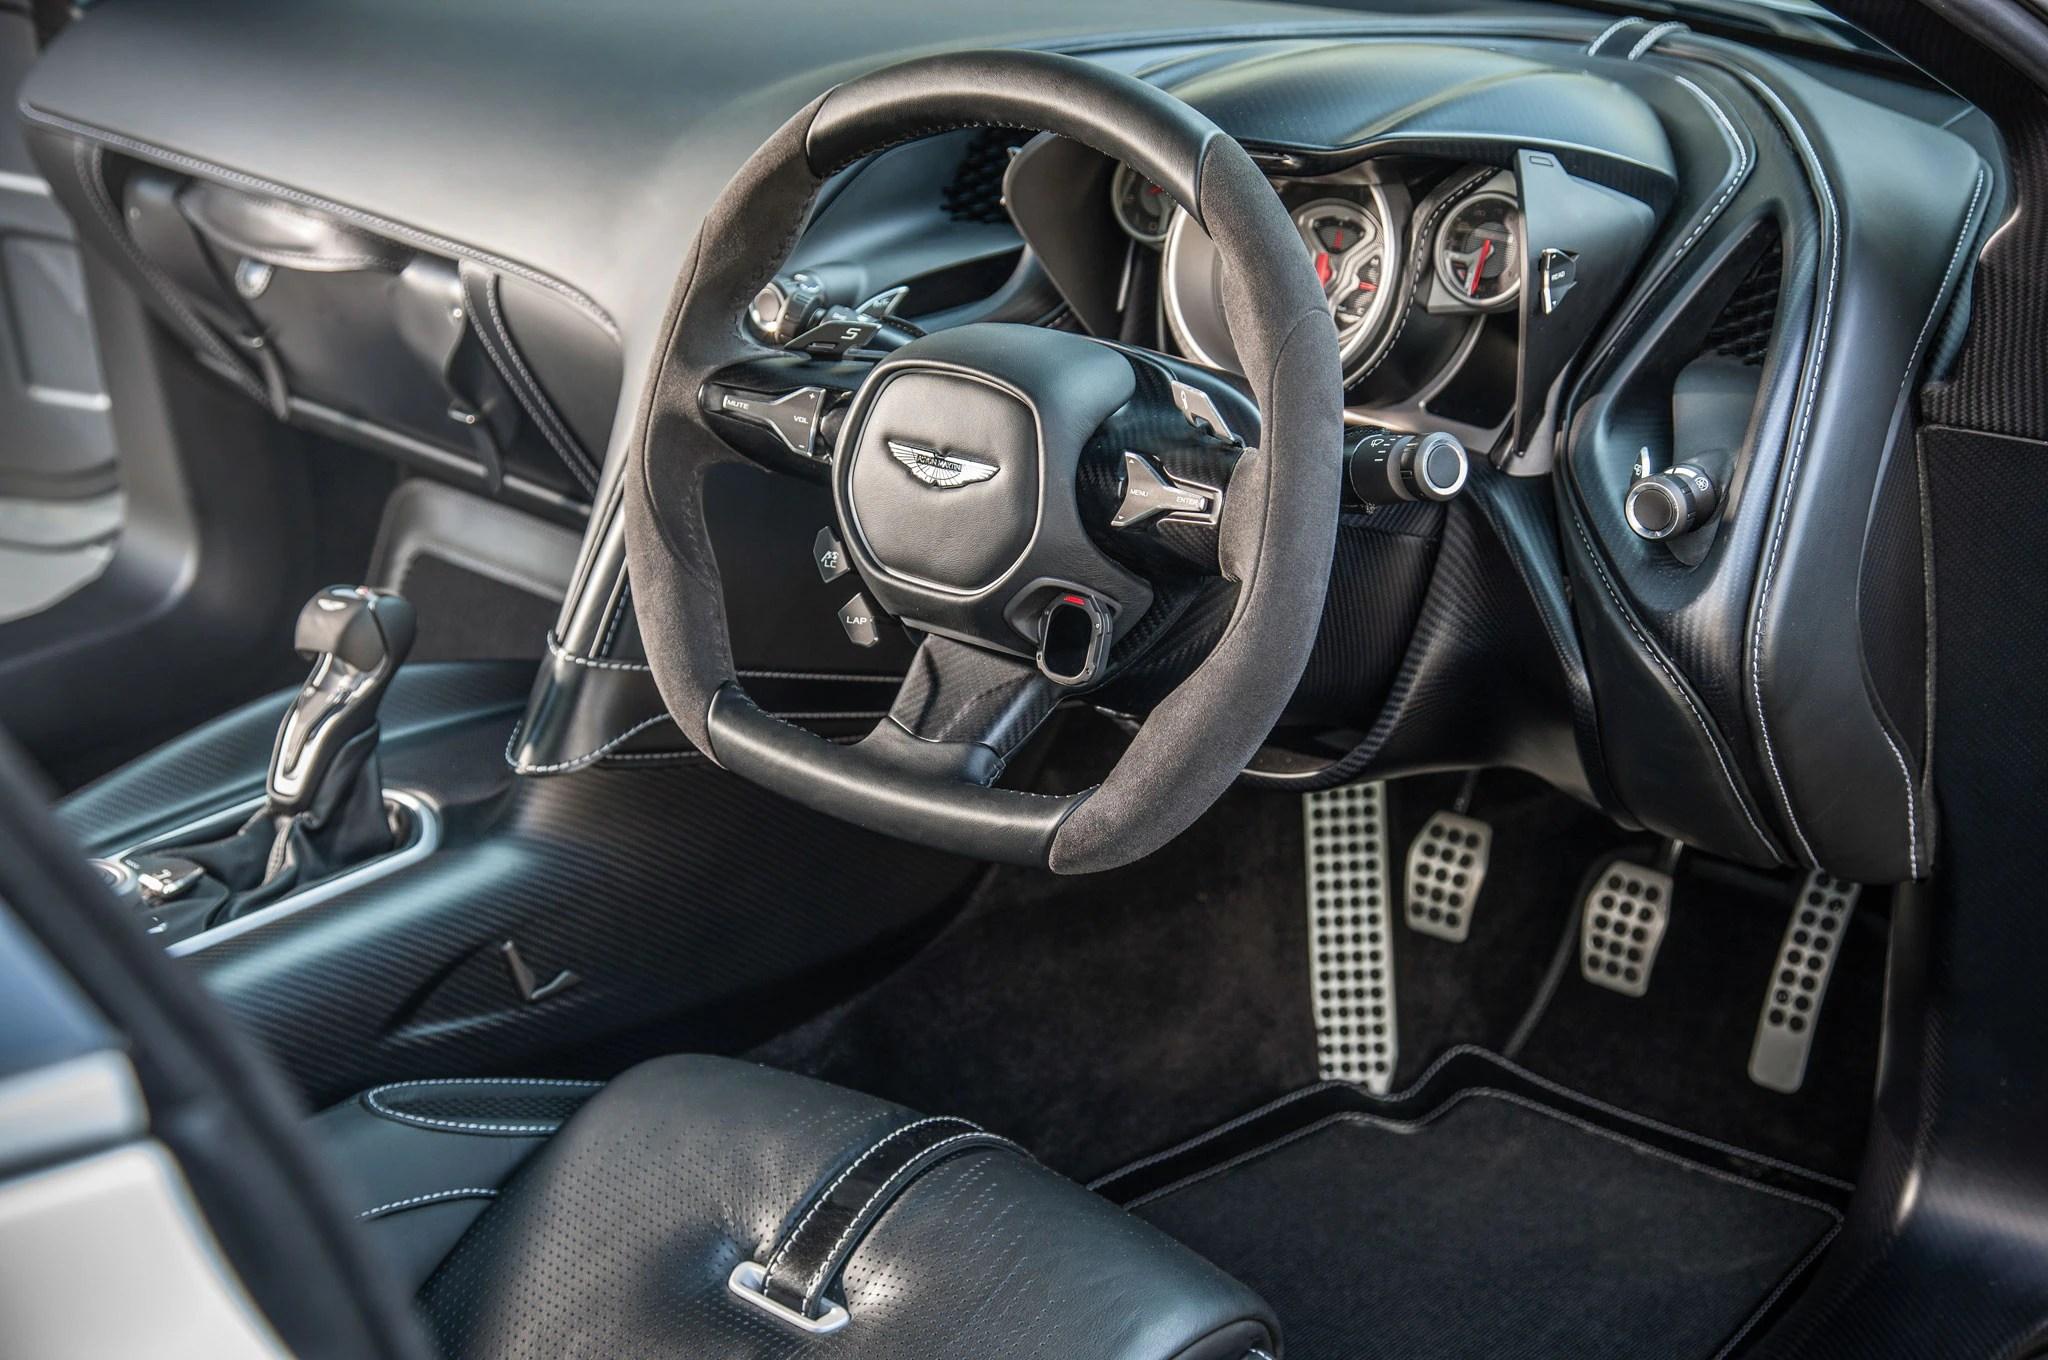 James Bond Car Wallpaper Bulletproof Driving James Bond S Aston Martin Db5 Dbs